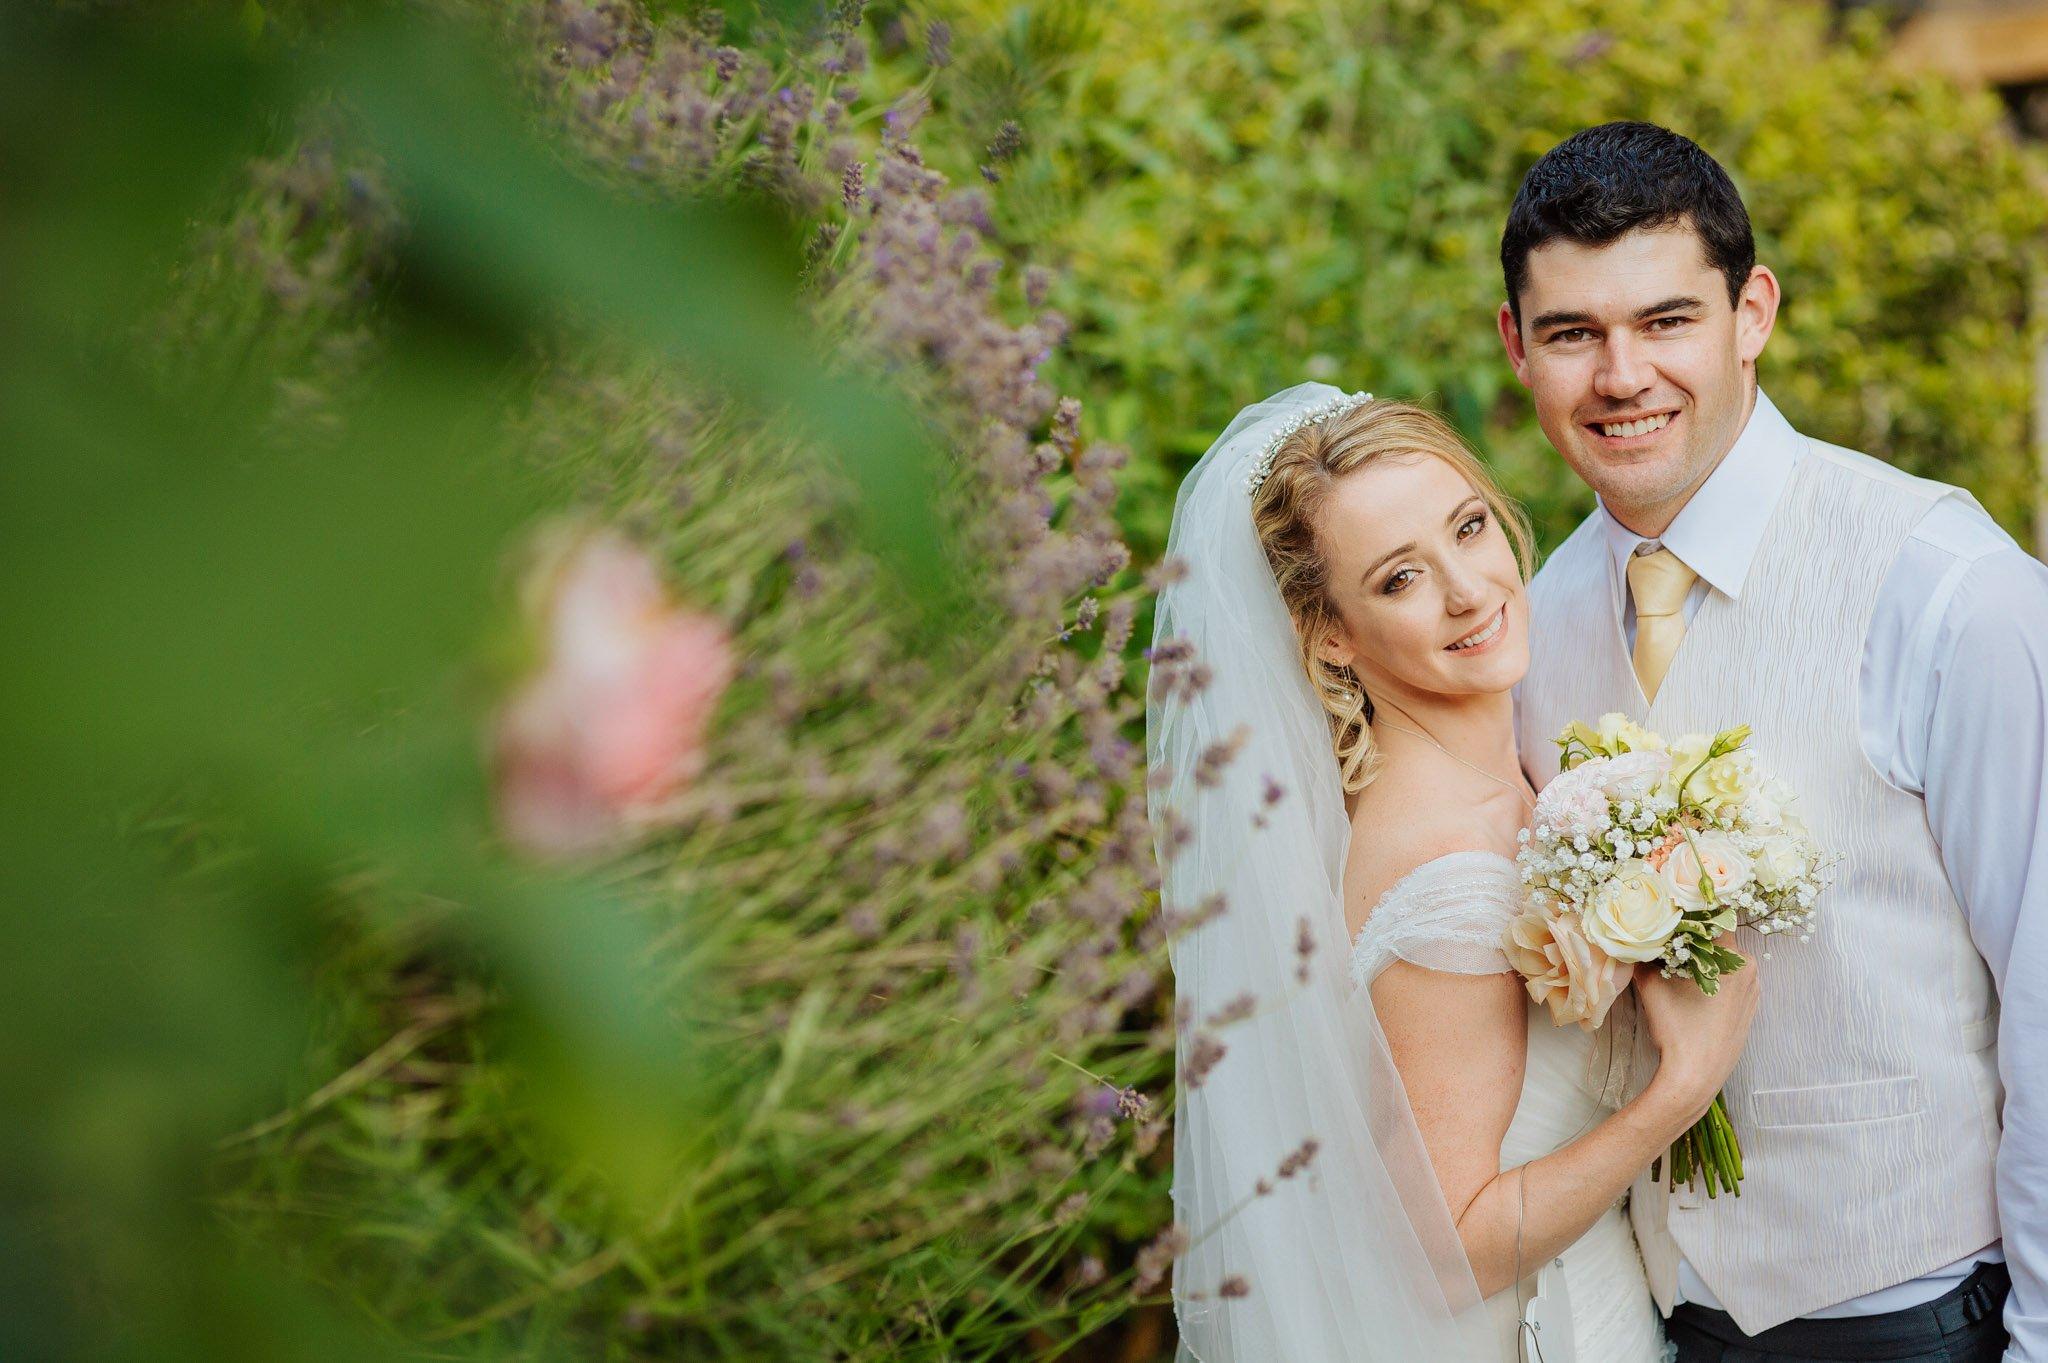 Georgina + Mike - Wedding photography in Malvern, Worcestershire 71